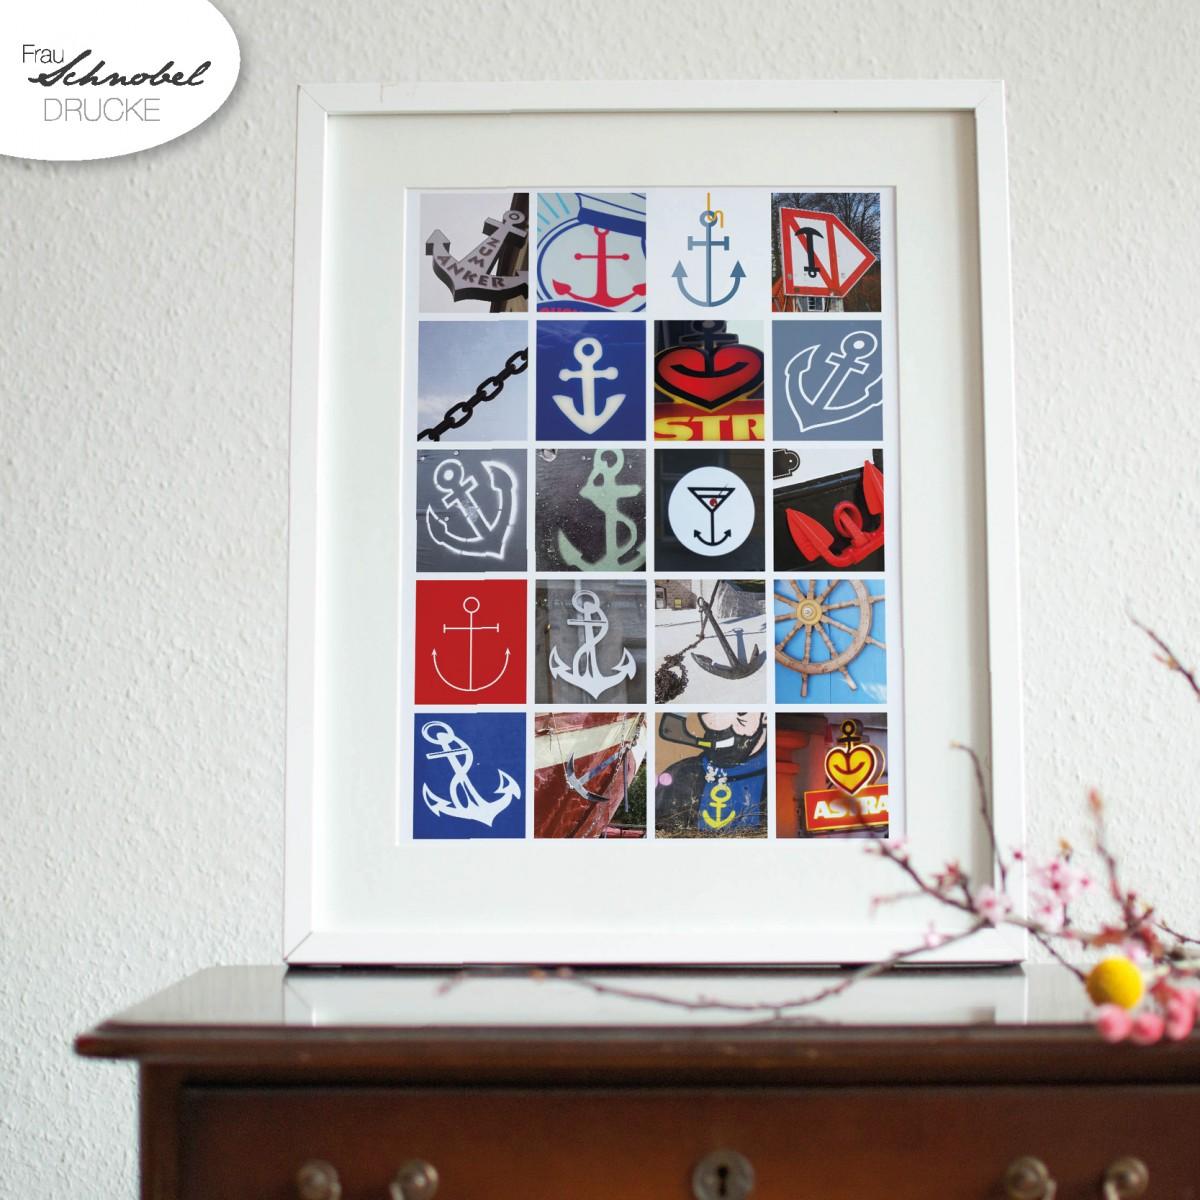 "Frau Schnobel Grafik-Druck ""Ankerfest"" NEUAUFLAGE, DIN A3 (297 x 420mm)"